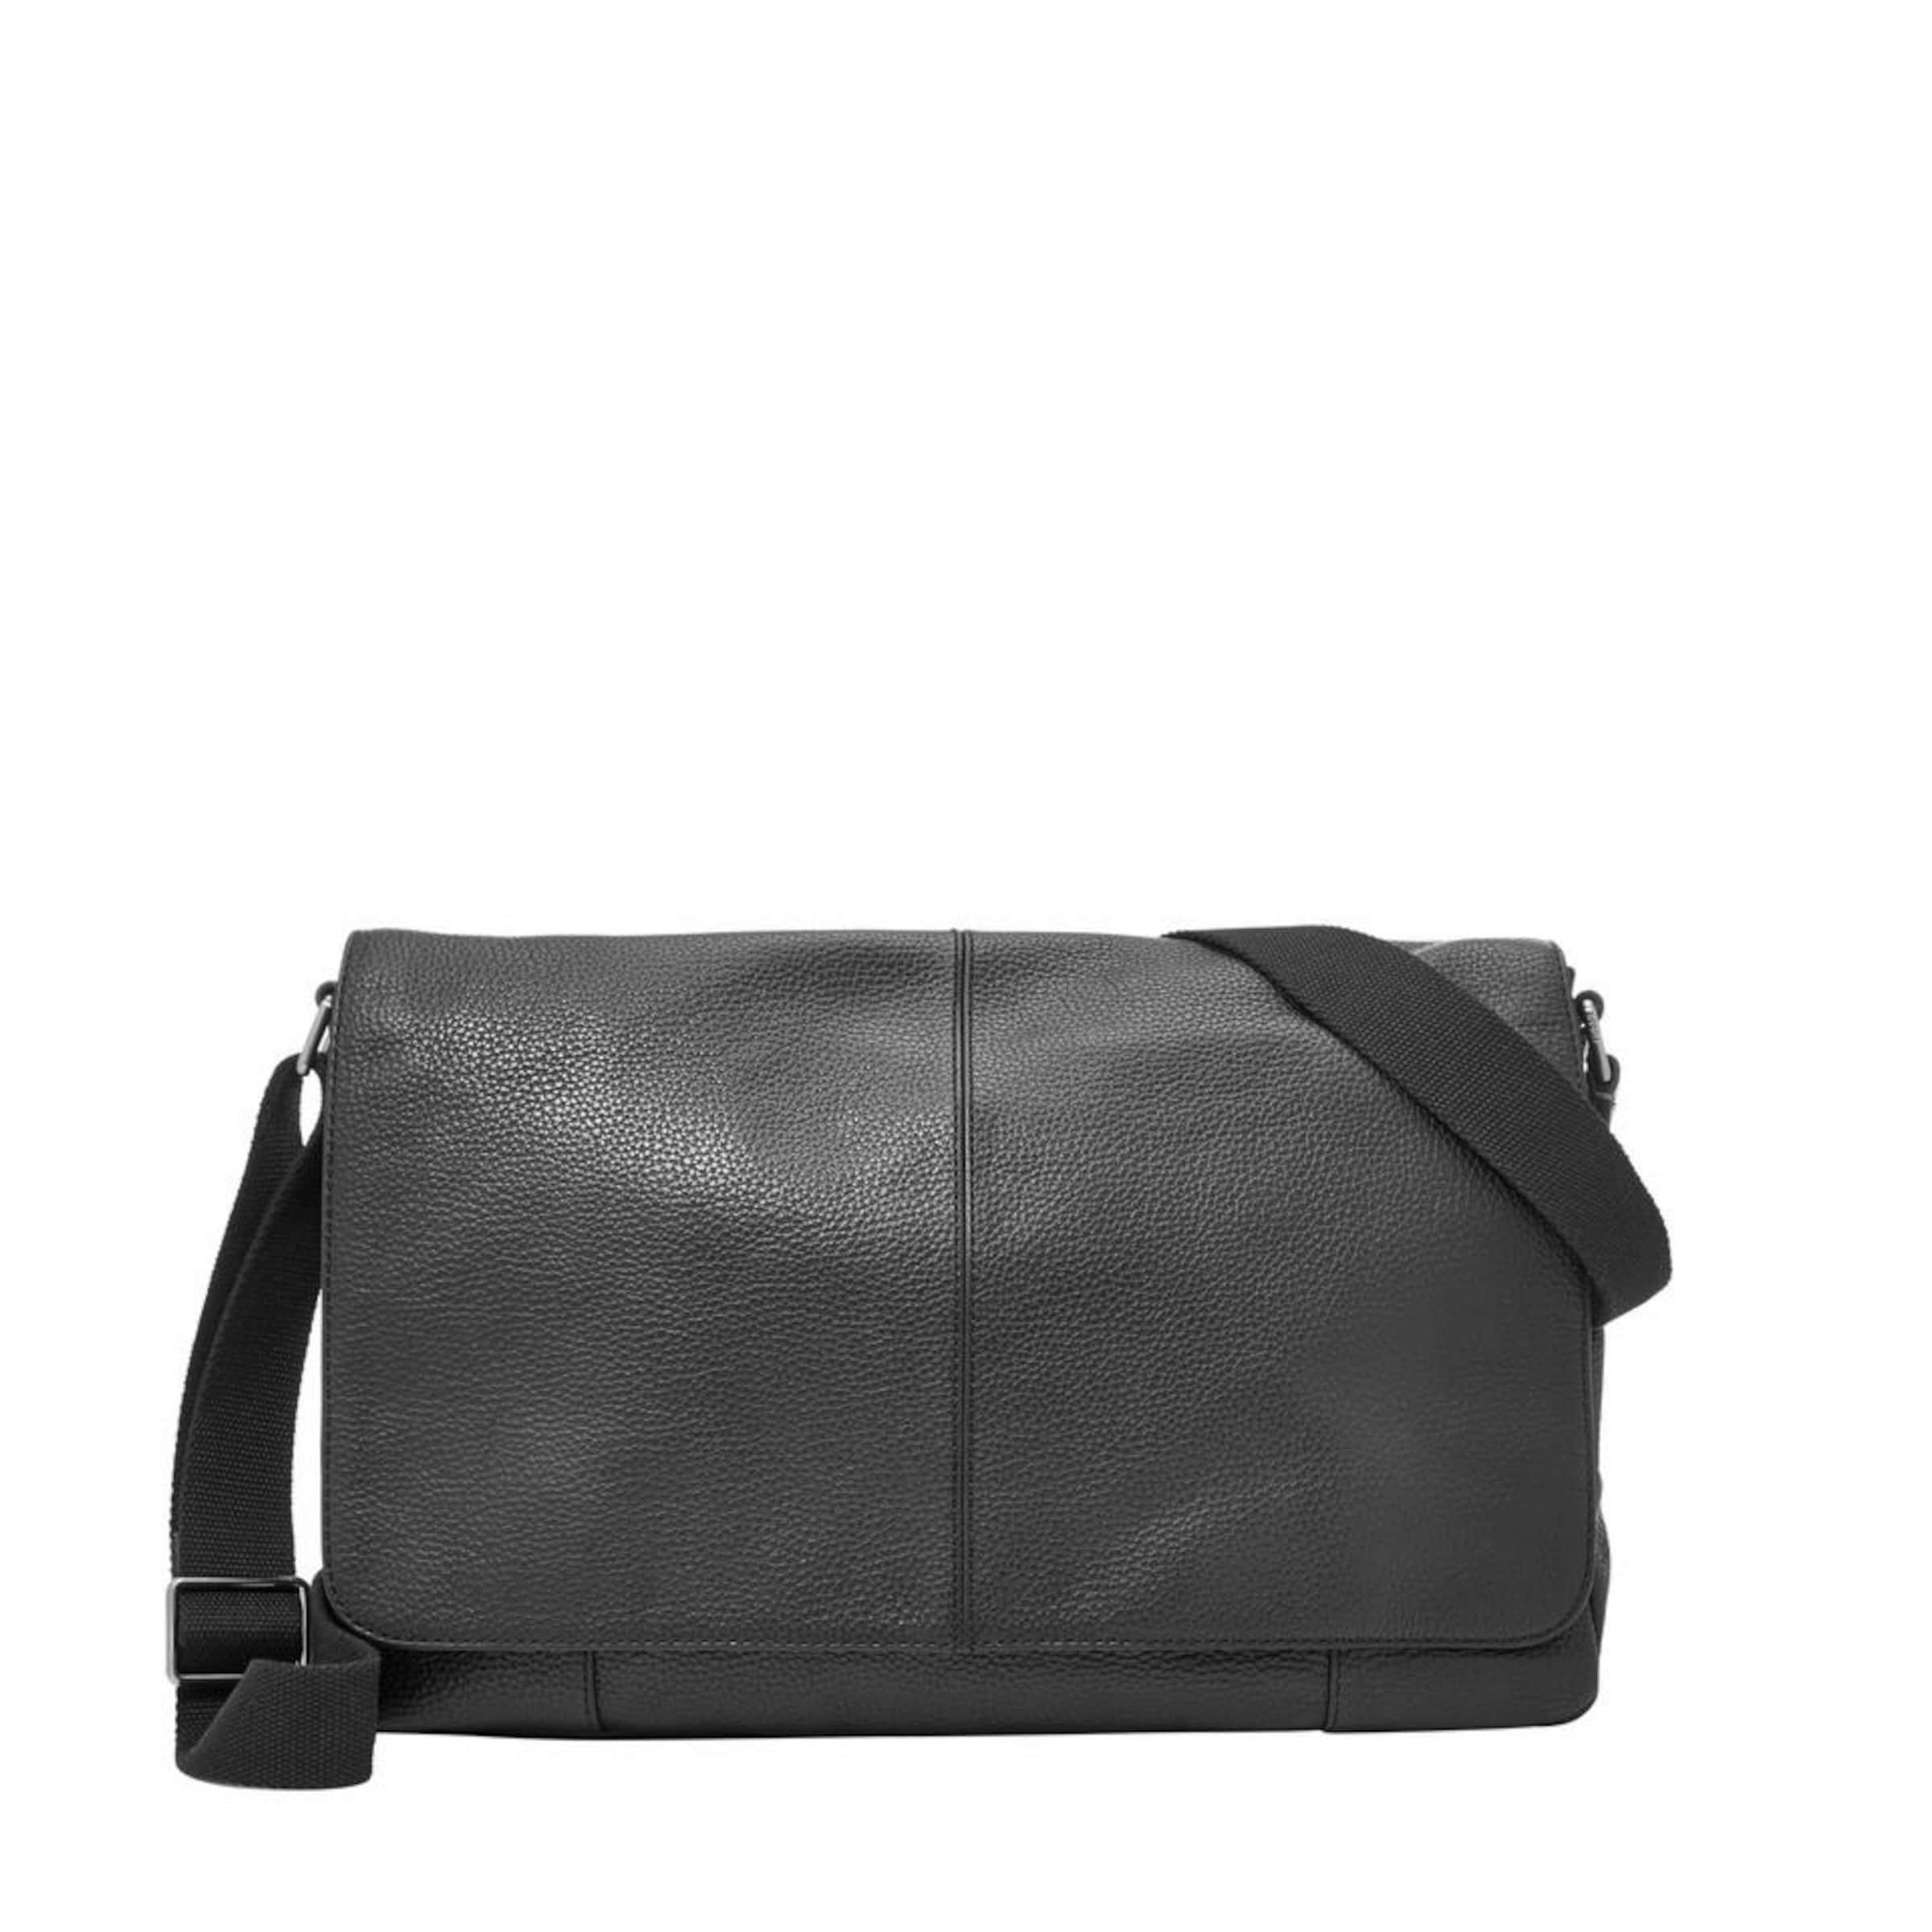 100% Original Online Shop FOSSIL Messenger Bag 'MAYFAIR' 43hXapVQ7n